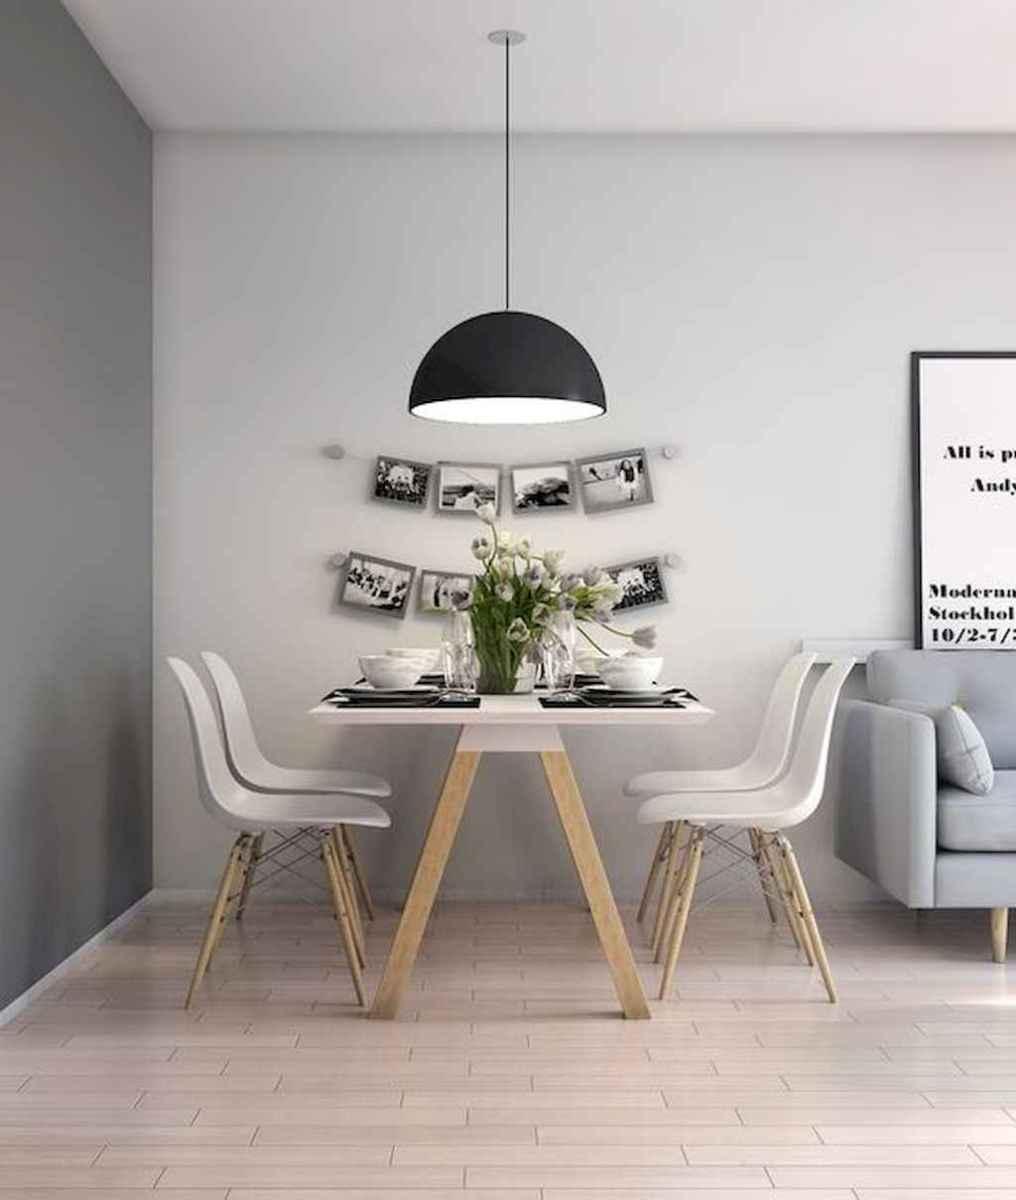 Awesome minimalist dining room decorating ideas (52)